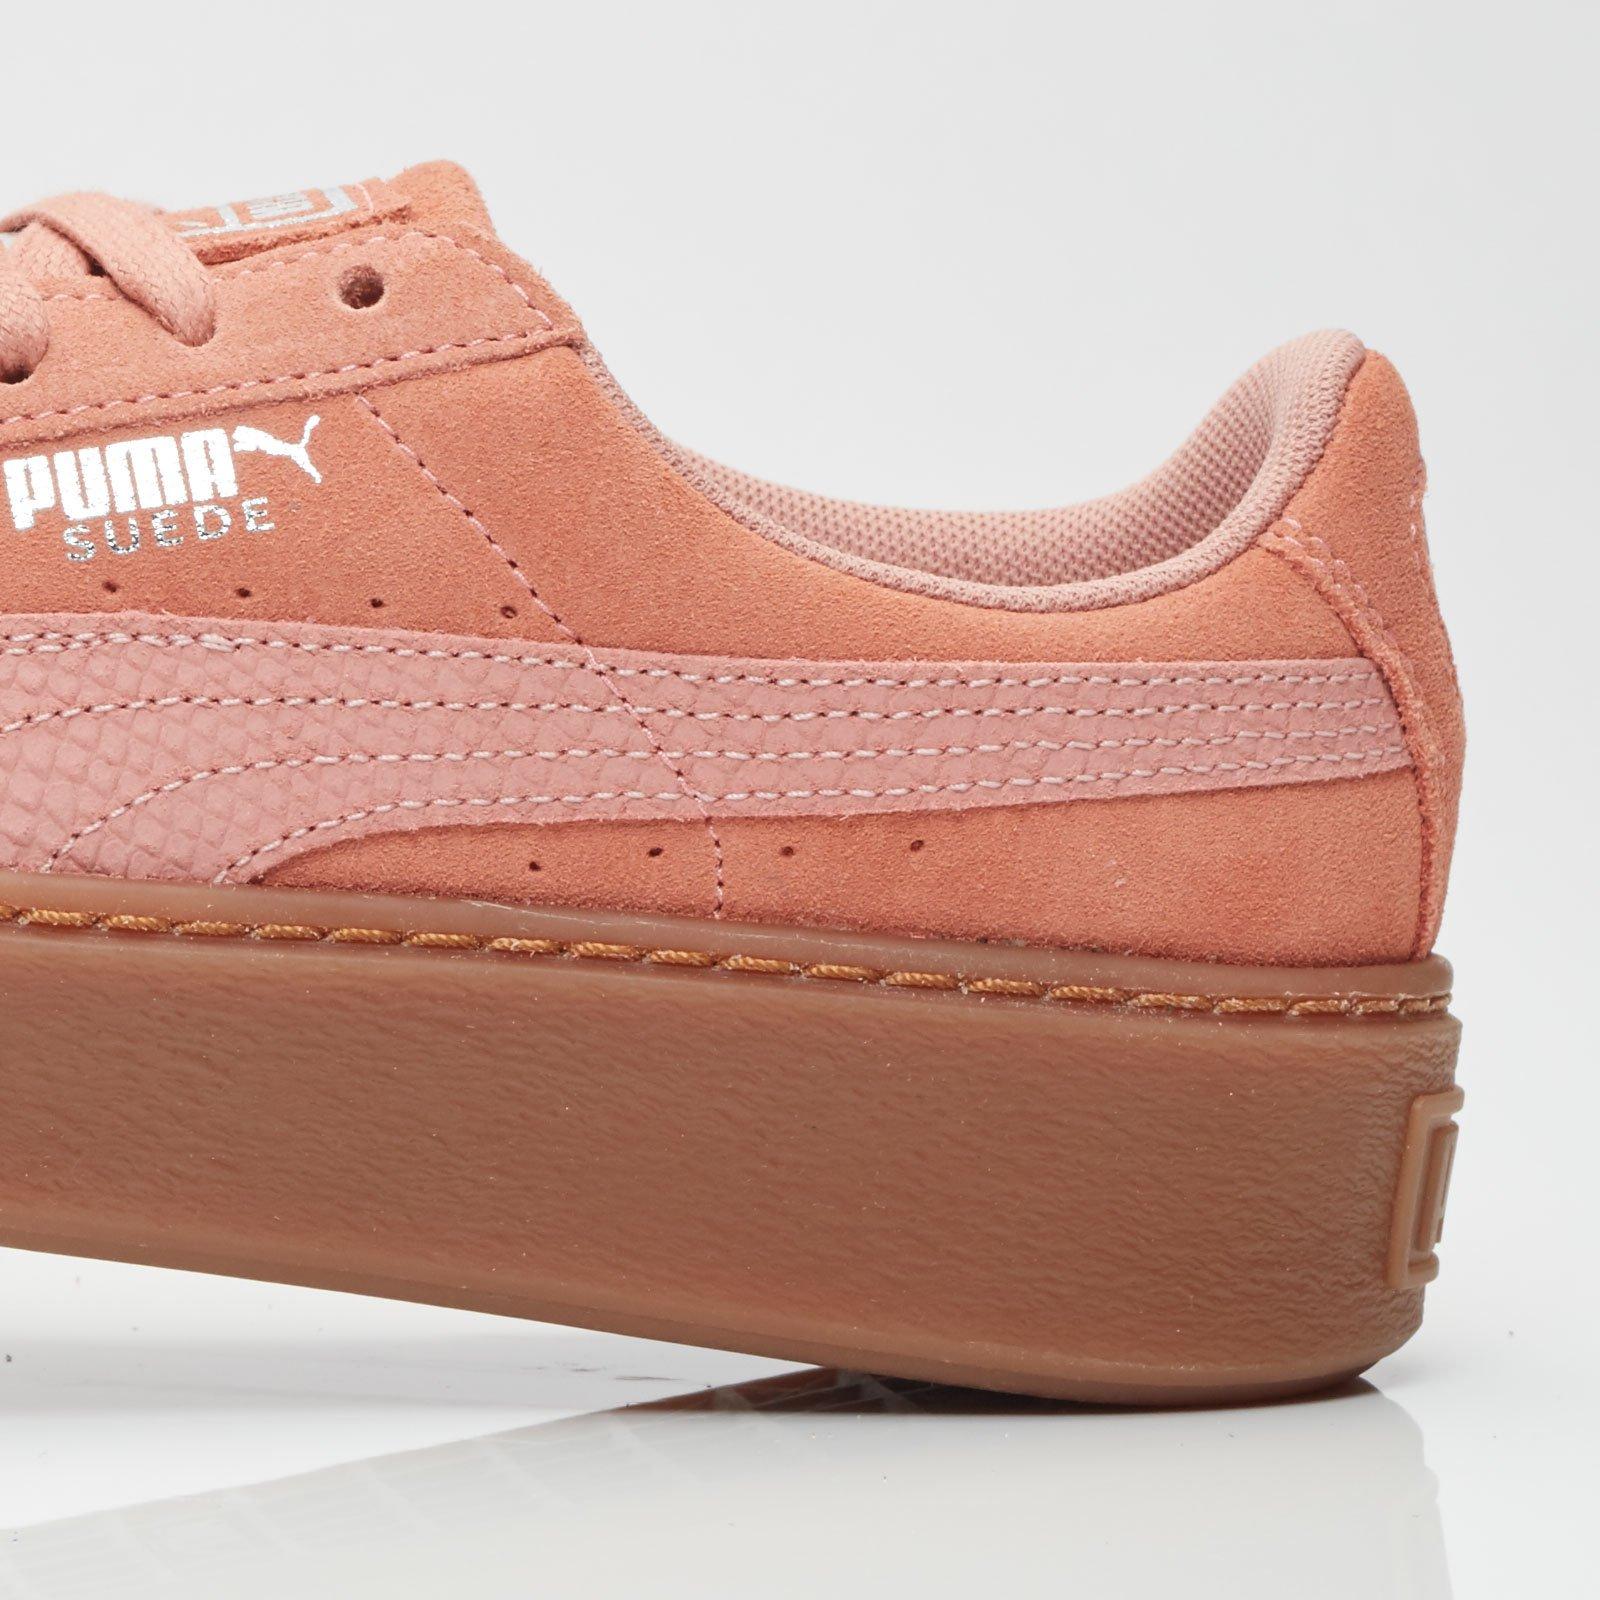 puma suede platform animal brown